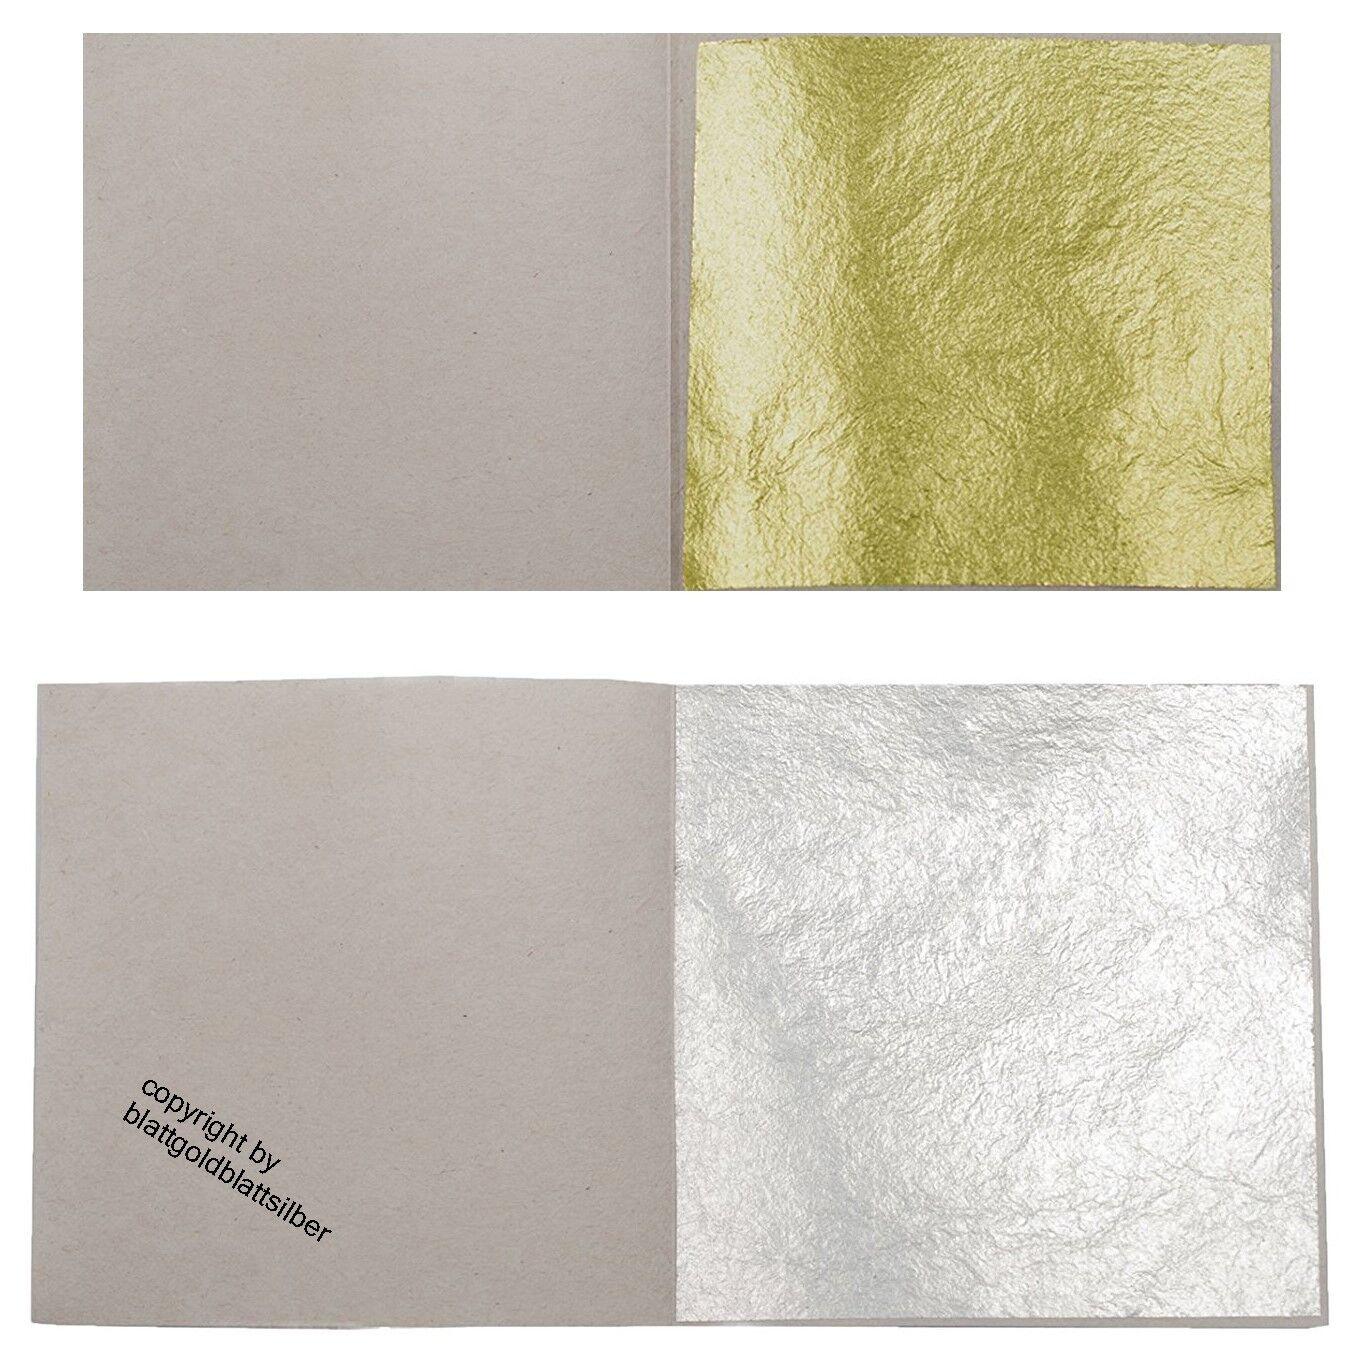 Blattgold Rosenobel-Doppelgold 23,5 Karat lose 8 x 8 cm zum vergolden Gold